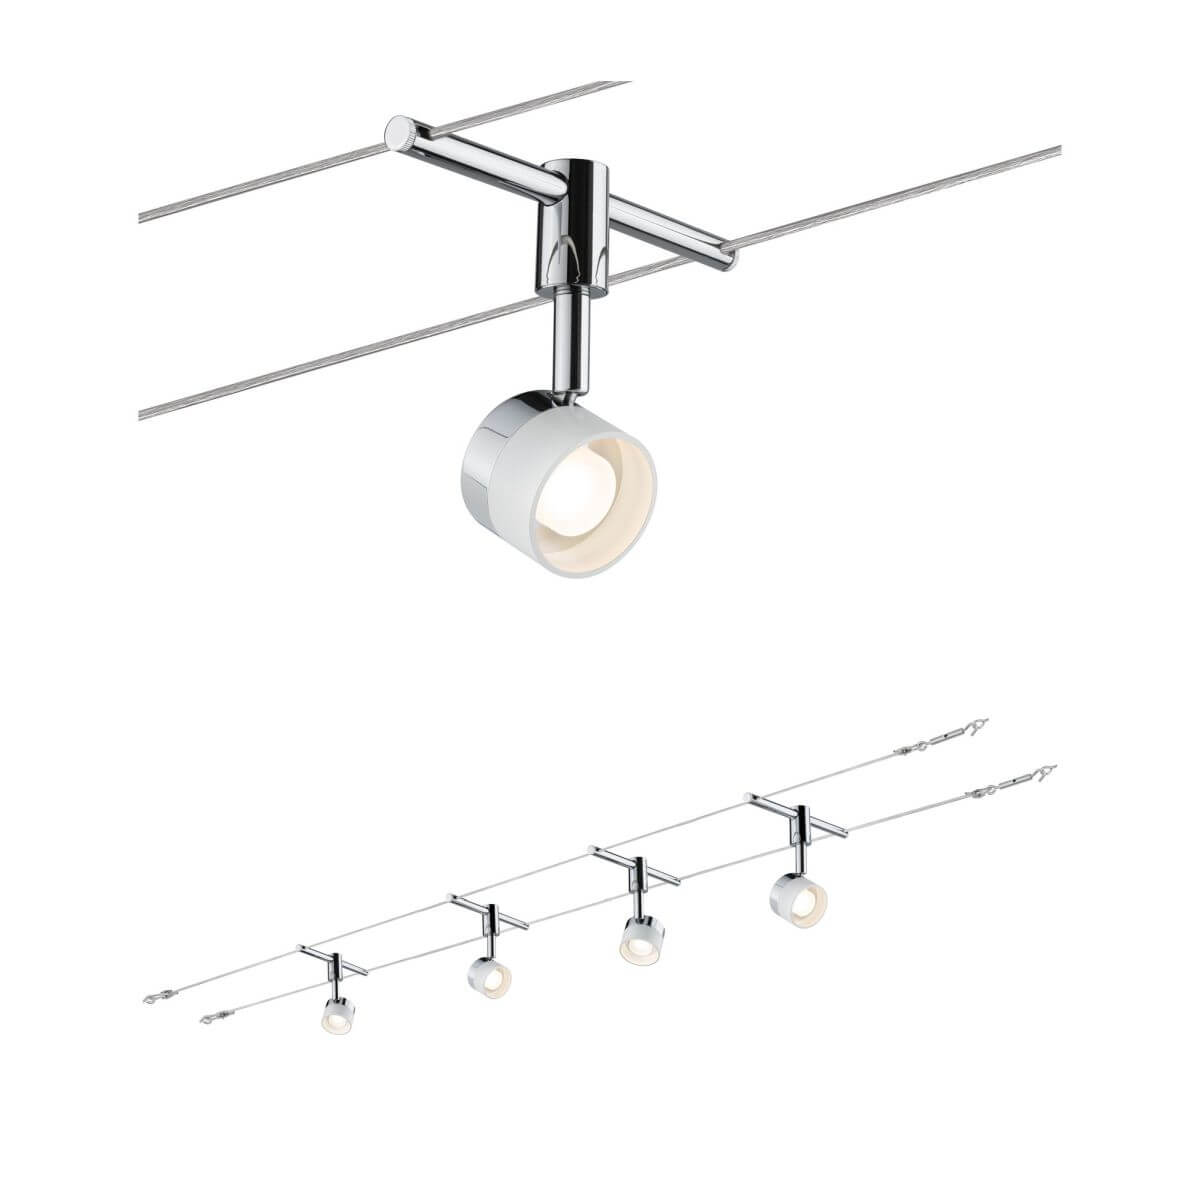 Paulmann LED Seil-Set, 4x5W, Stage, 12V AC, Weiß, Chrom